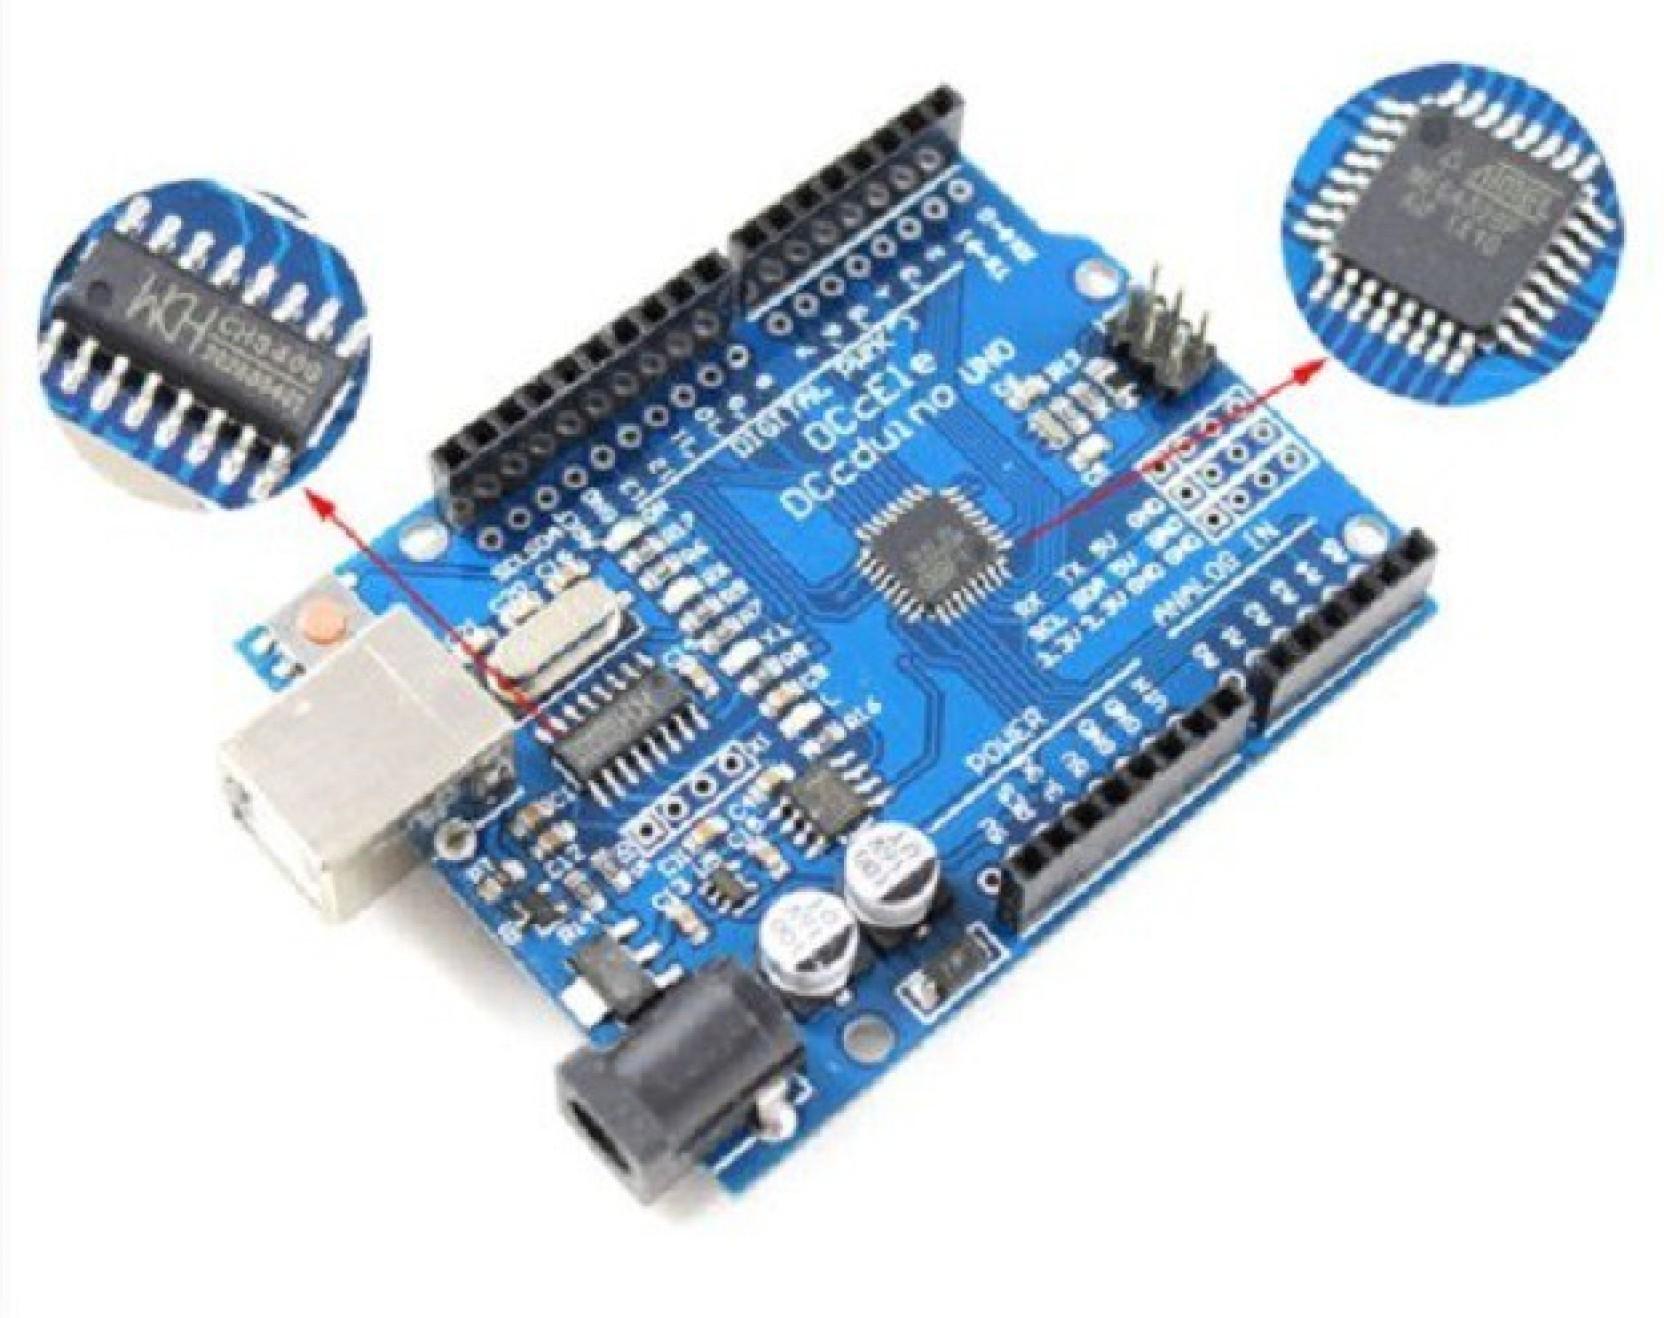 Xcluma Arduino Uno R3 Compatible Board Atmega328p Ch340g No Usb How To Use Wtv020sd Music Module With Build Circuit Home